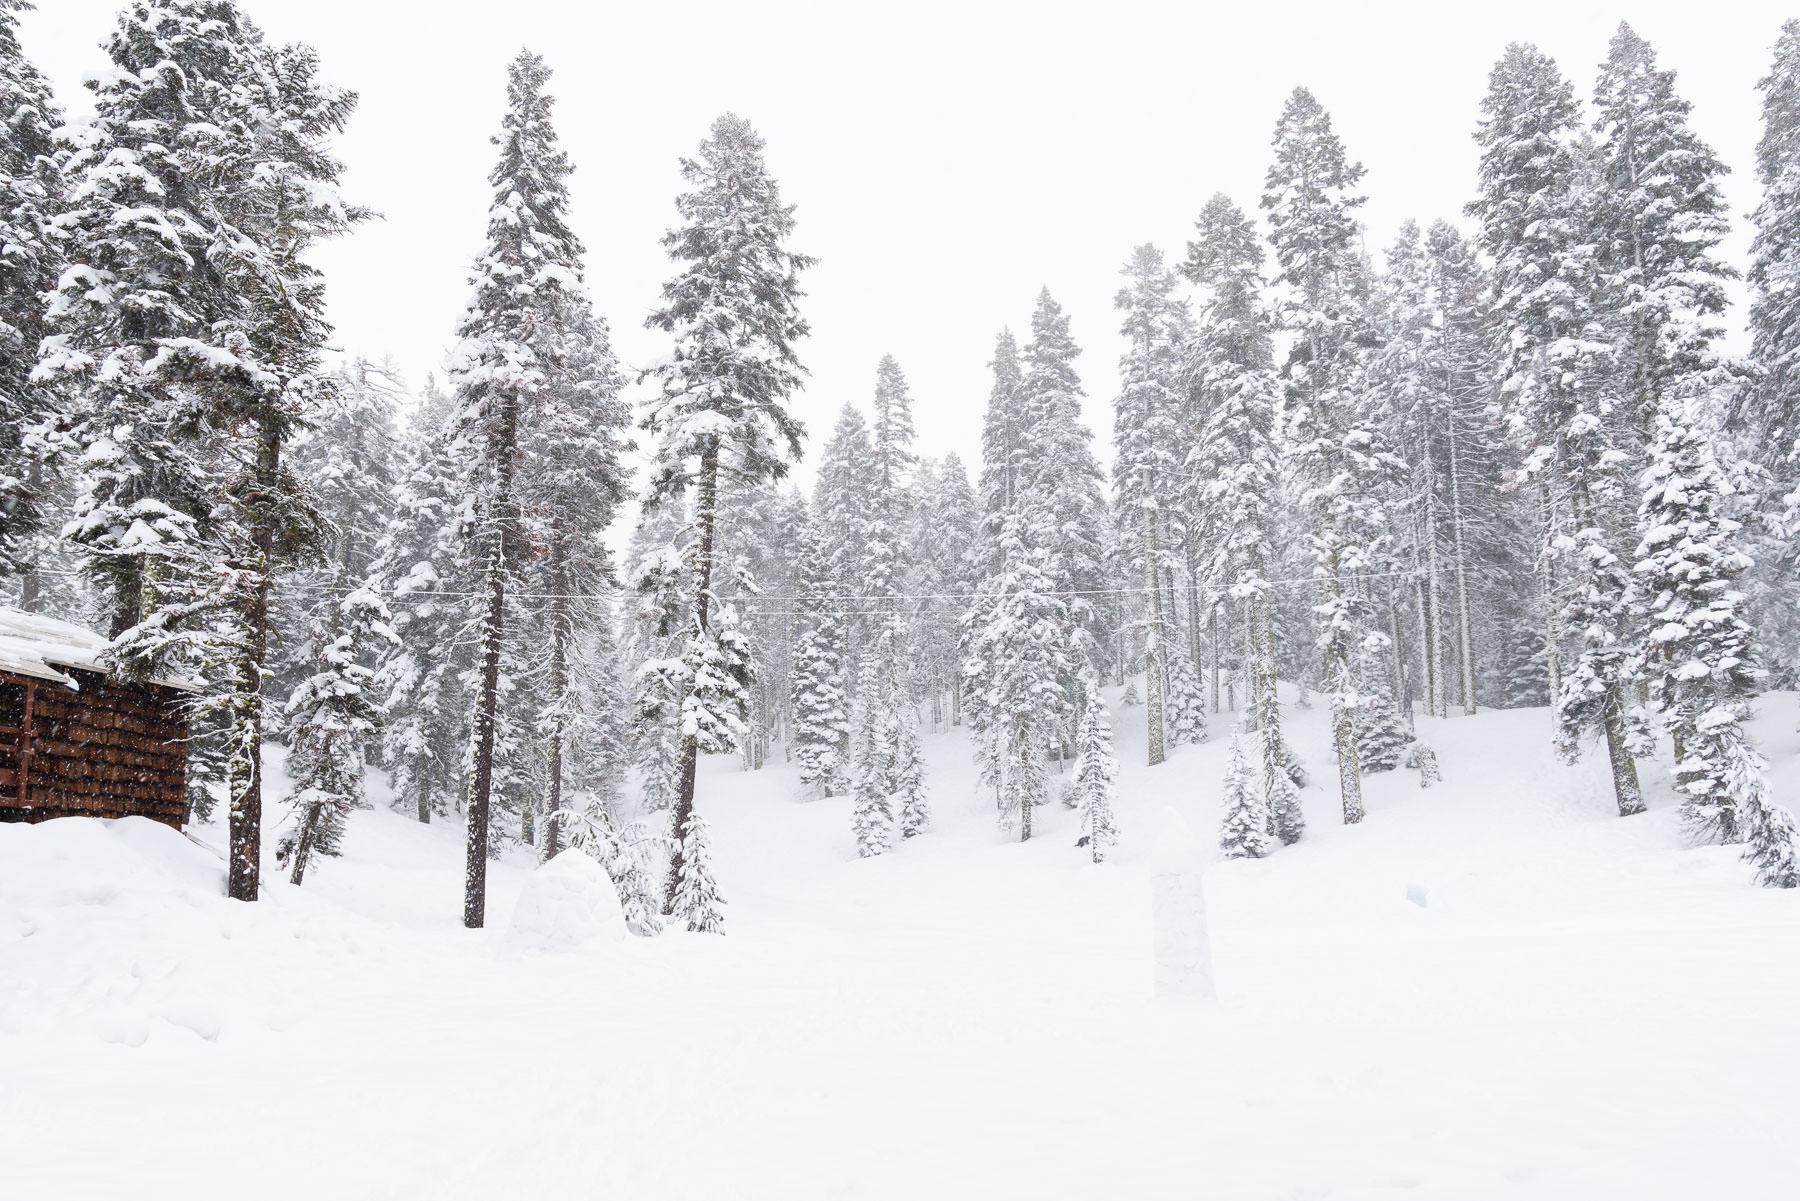 2019.03.23 Snowy Tahoe © Jennifer Carr Photography-8.jpg